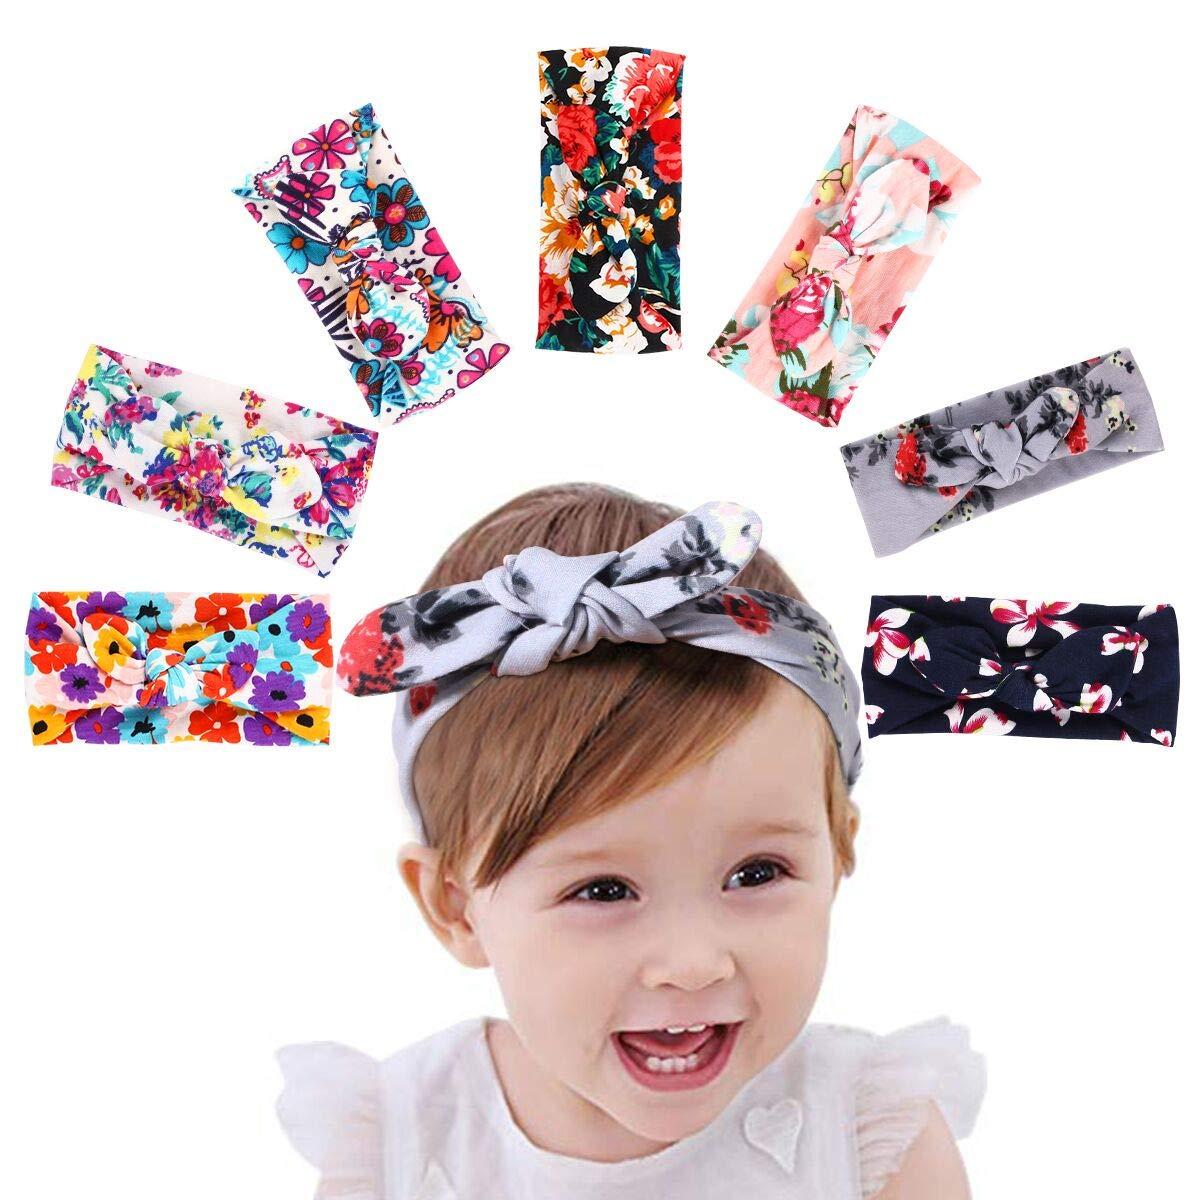 HBselect Baby Girl Headband 6 Pcs Cute Bowknot Hair Band Elastic Turban